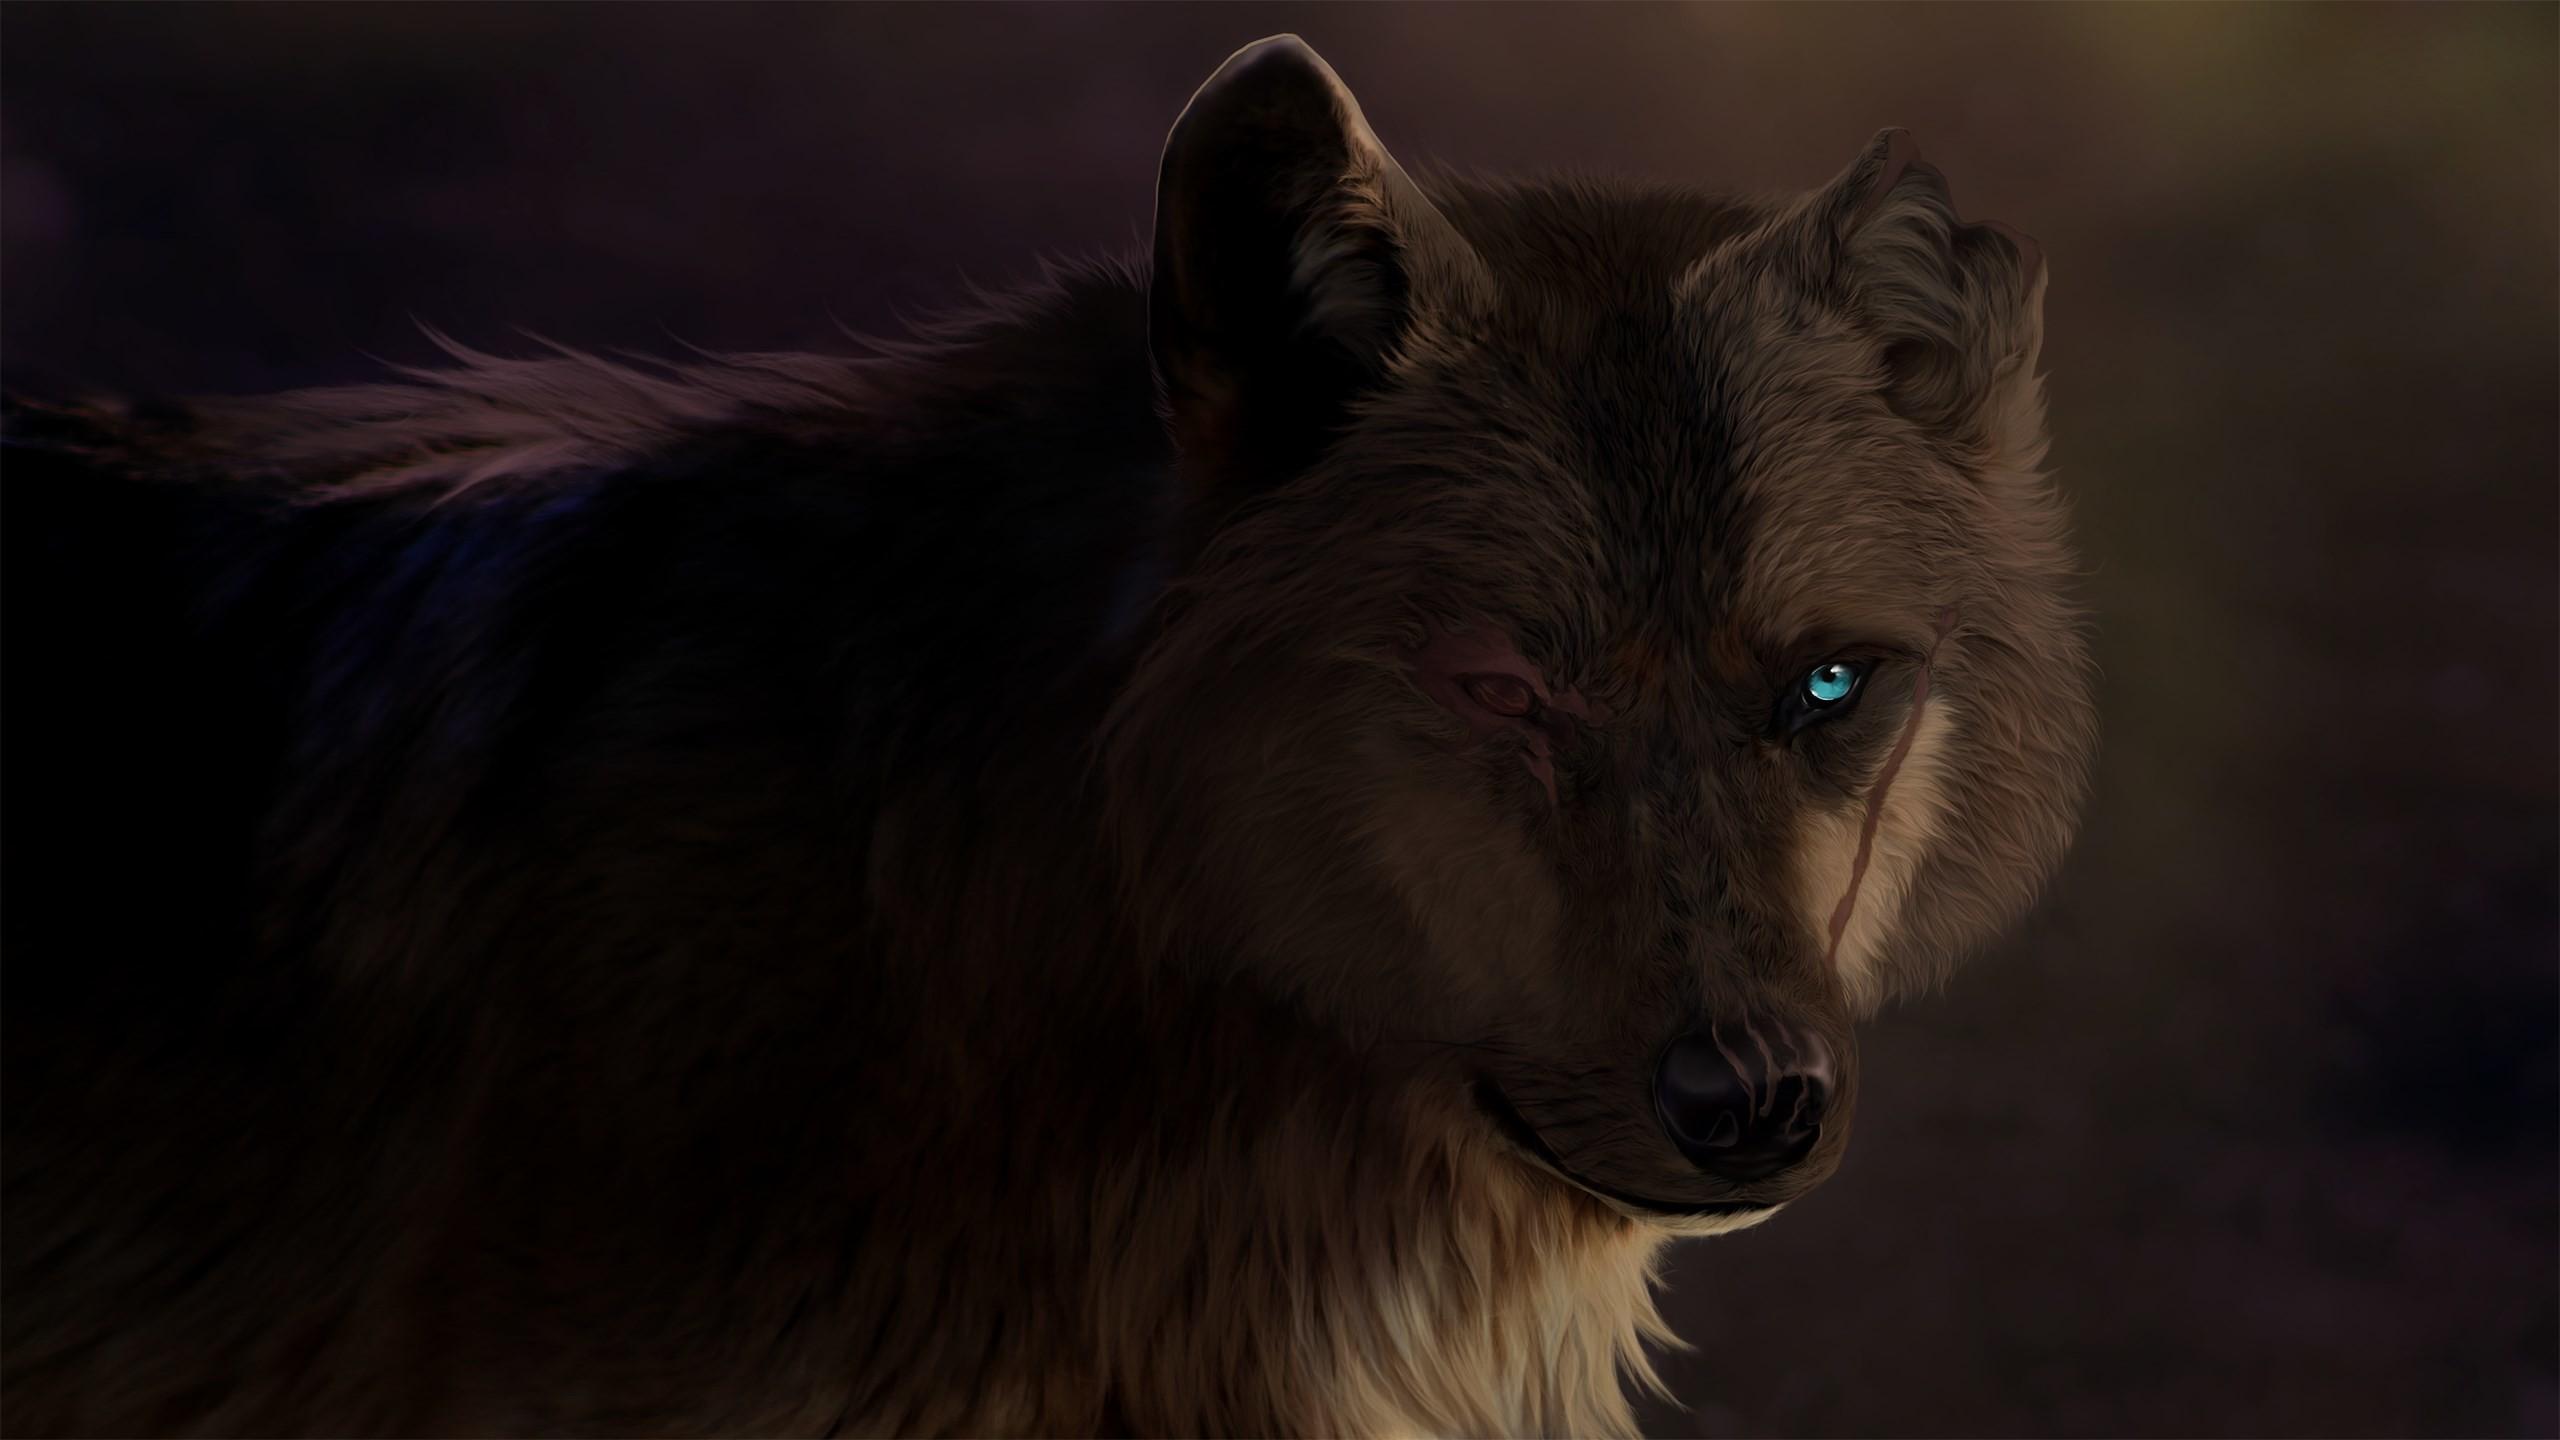 картинки волка одиночки на голубом фоне на рабочий стол